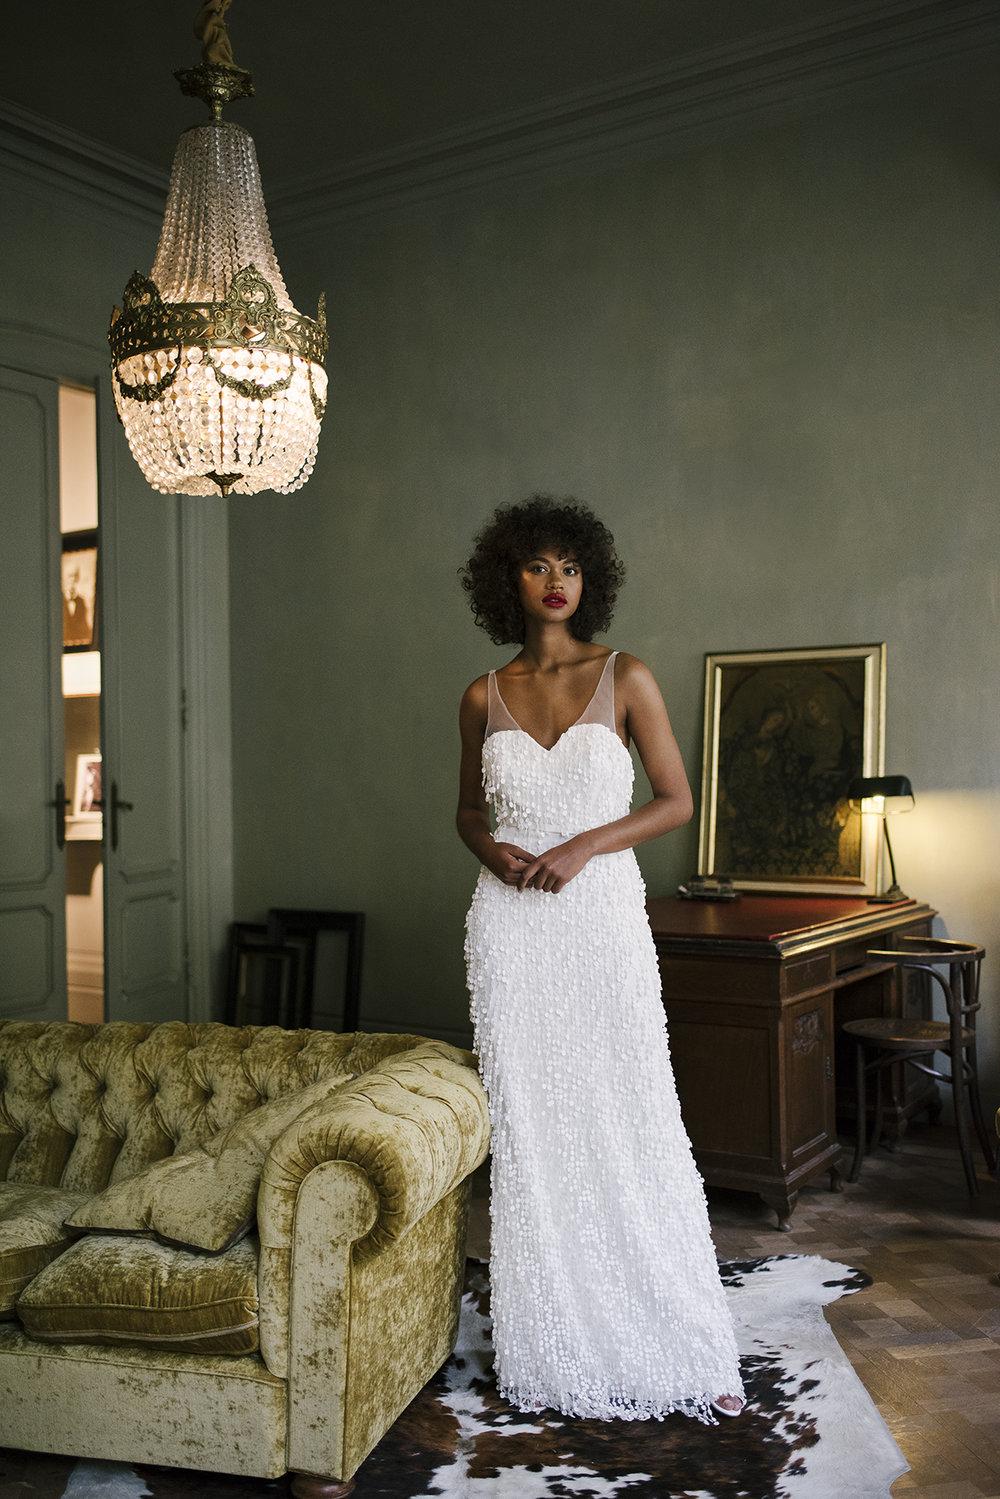 valentine-avoh-robe-mariee-rita-wedding-dress-bruxelles-photo-elodie-timmermans-9.jpg